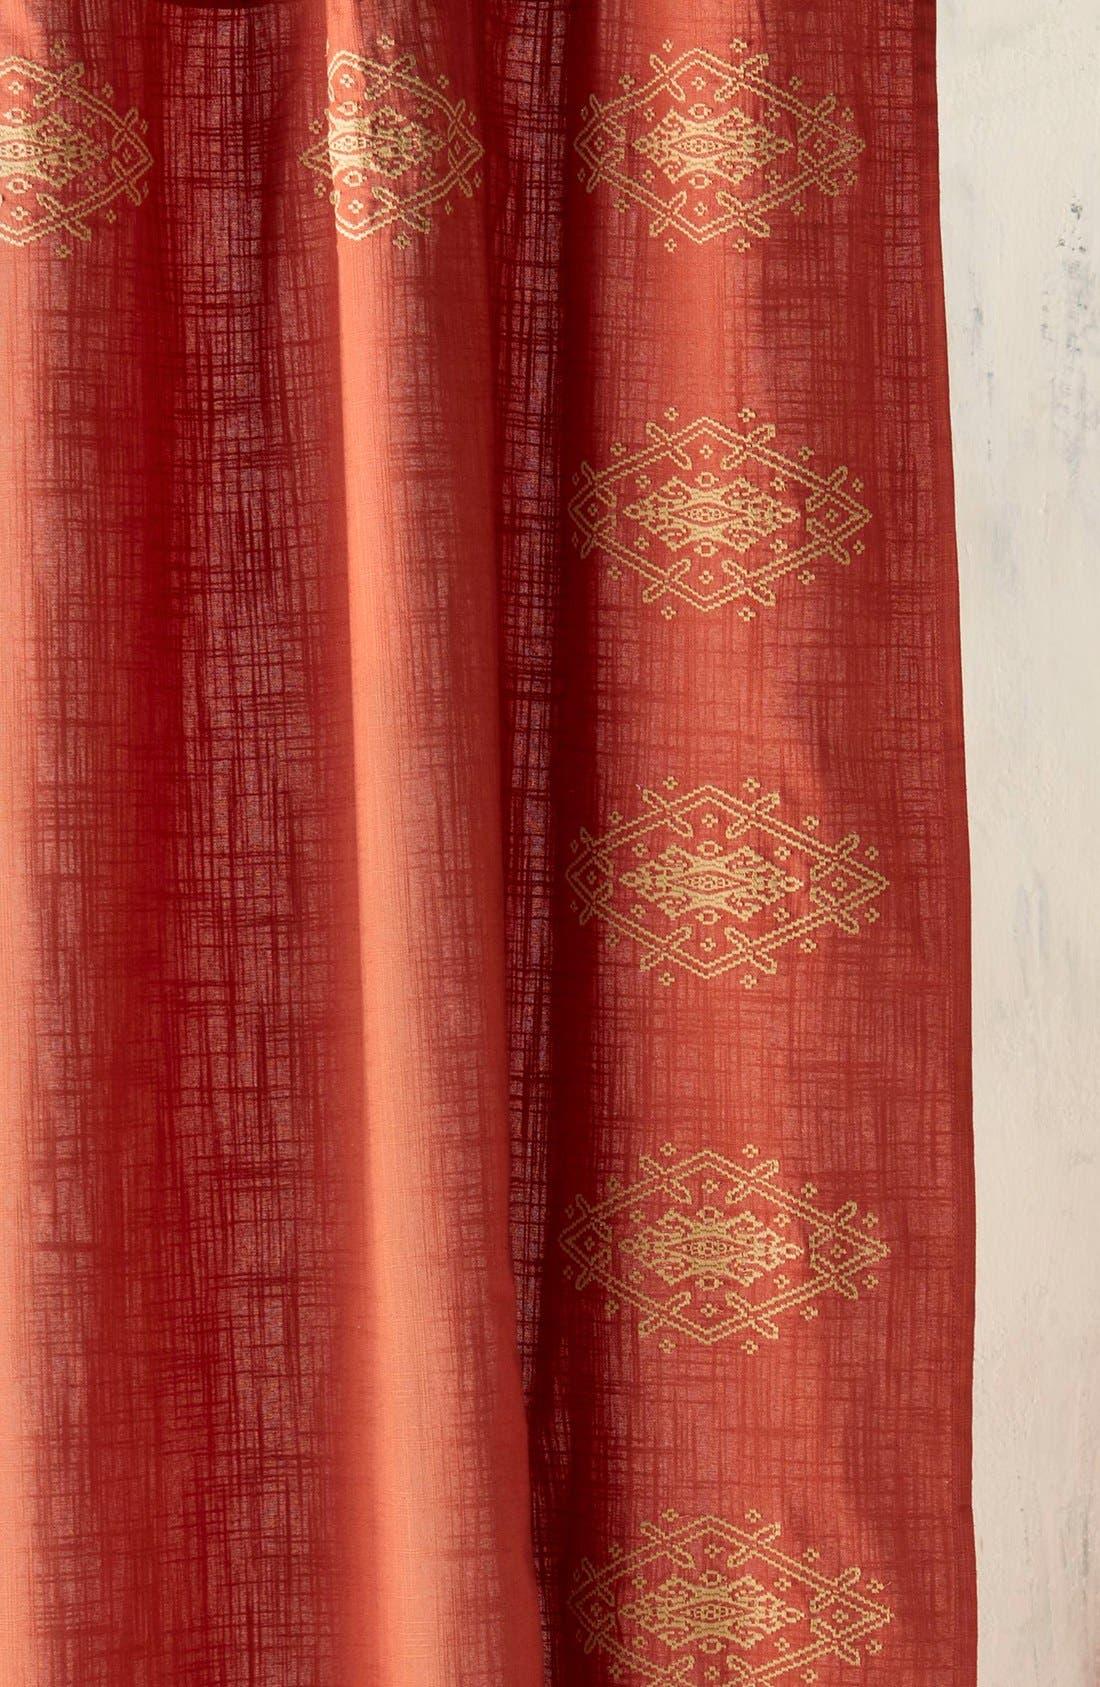 'Cusa' Shower Curtain,                             Alternate thumbnail 2, color,                             600